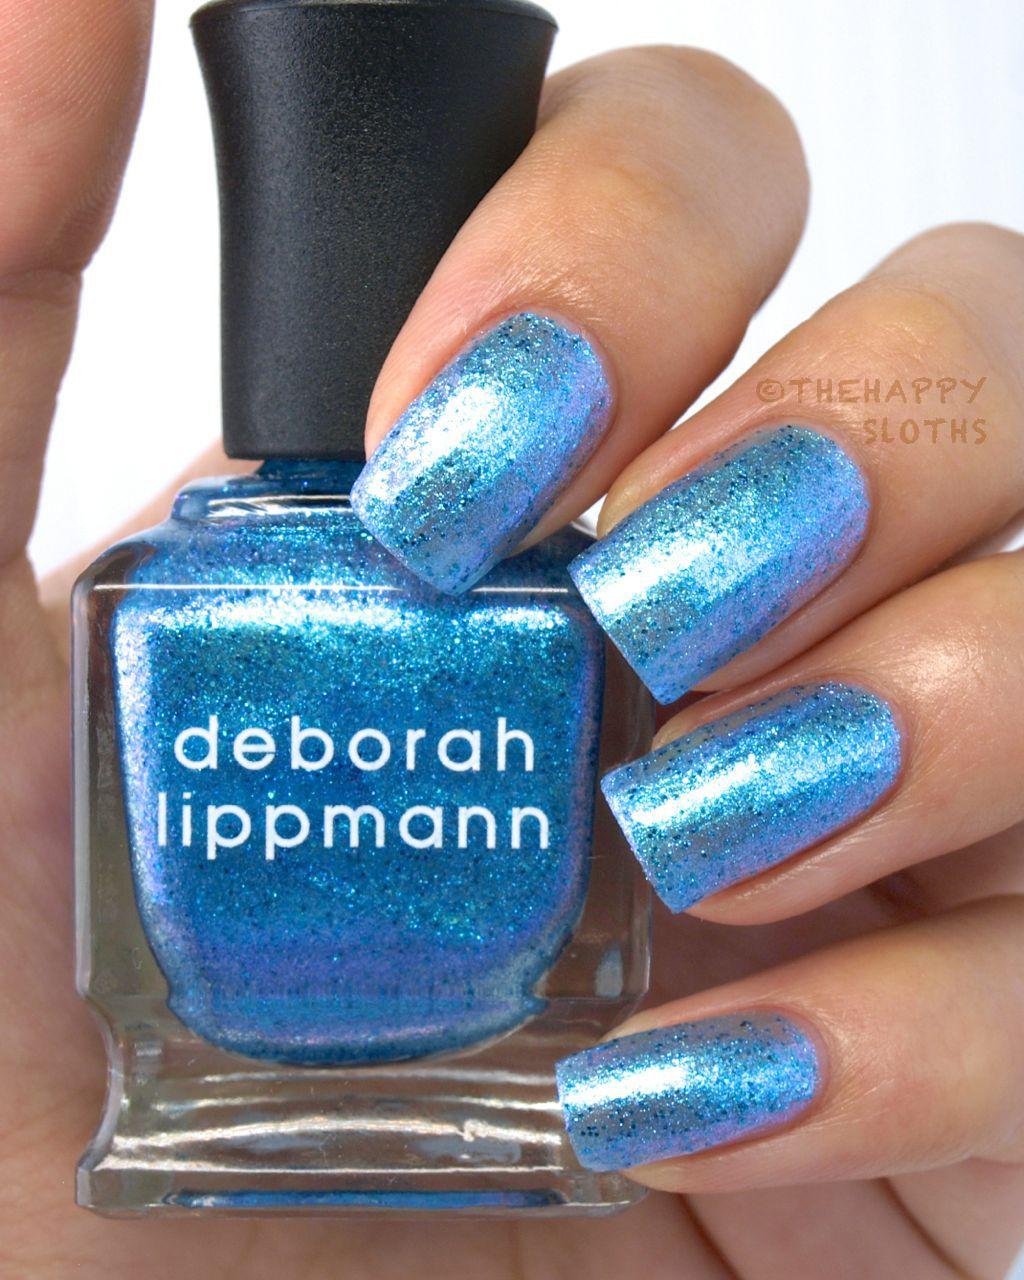 Deborah Lippmann Xanadu from Holiday 2014 Collection - pretty on its ...